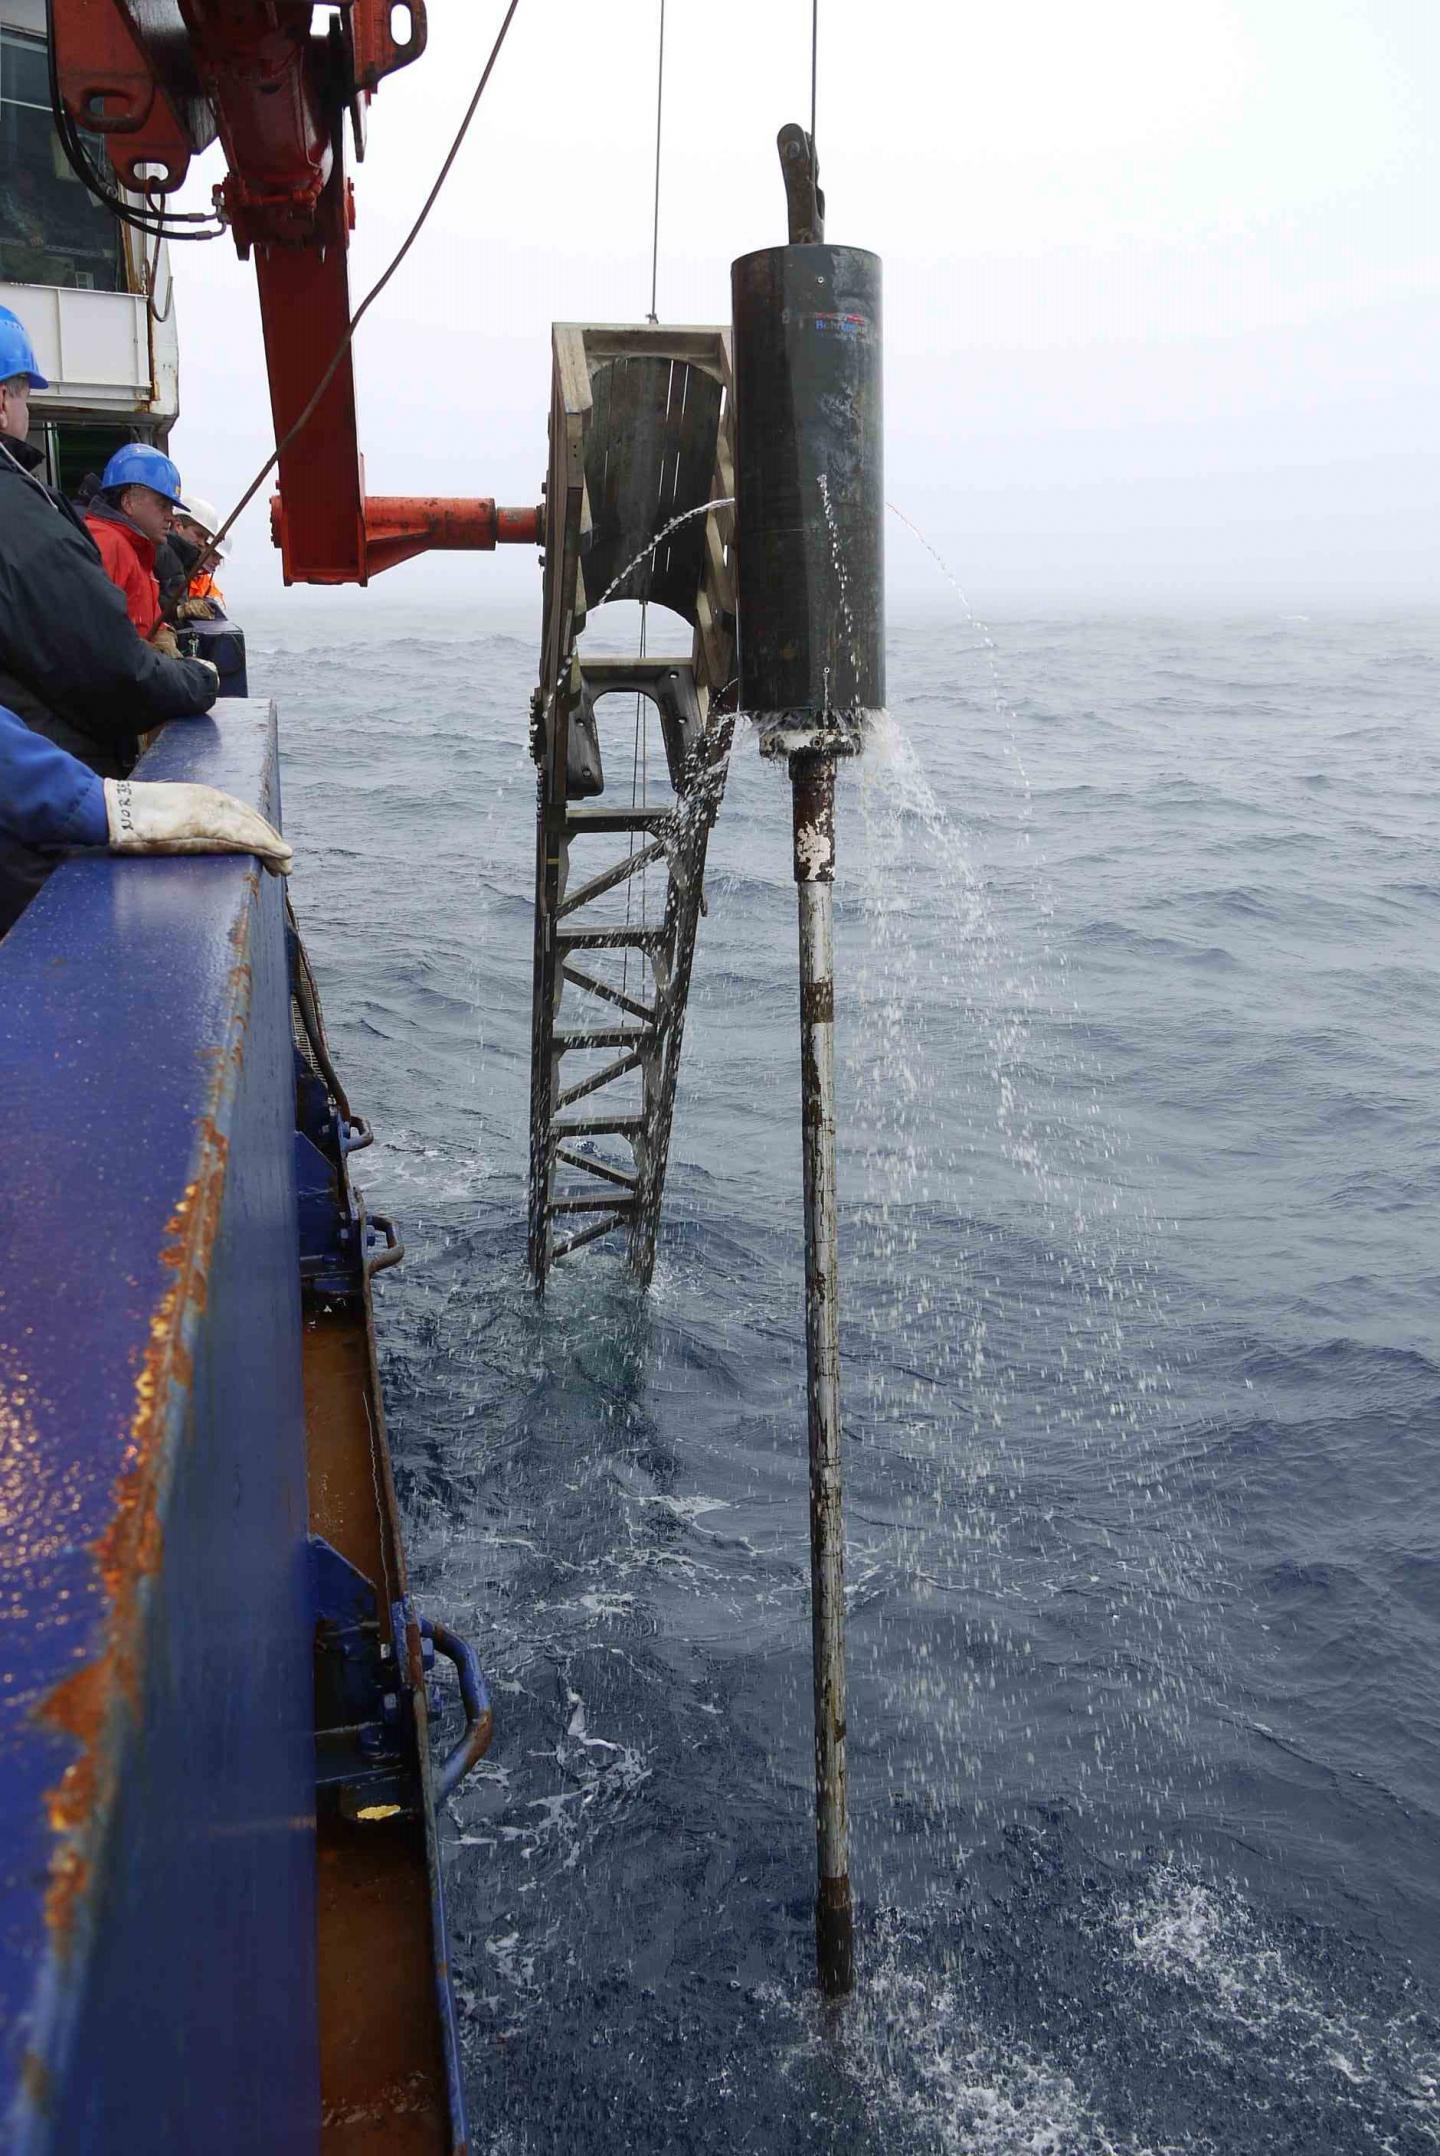 Work Aboard the RV Polarstern